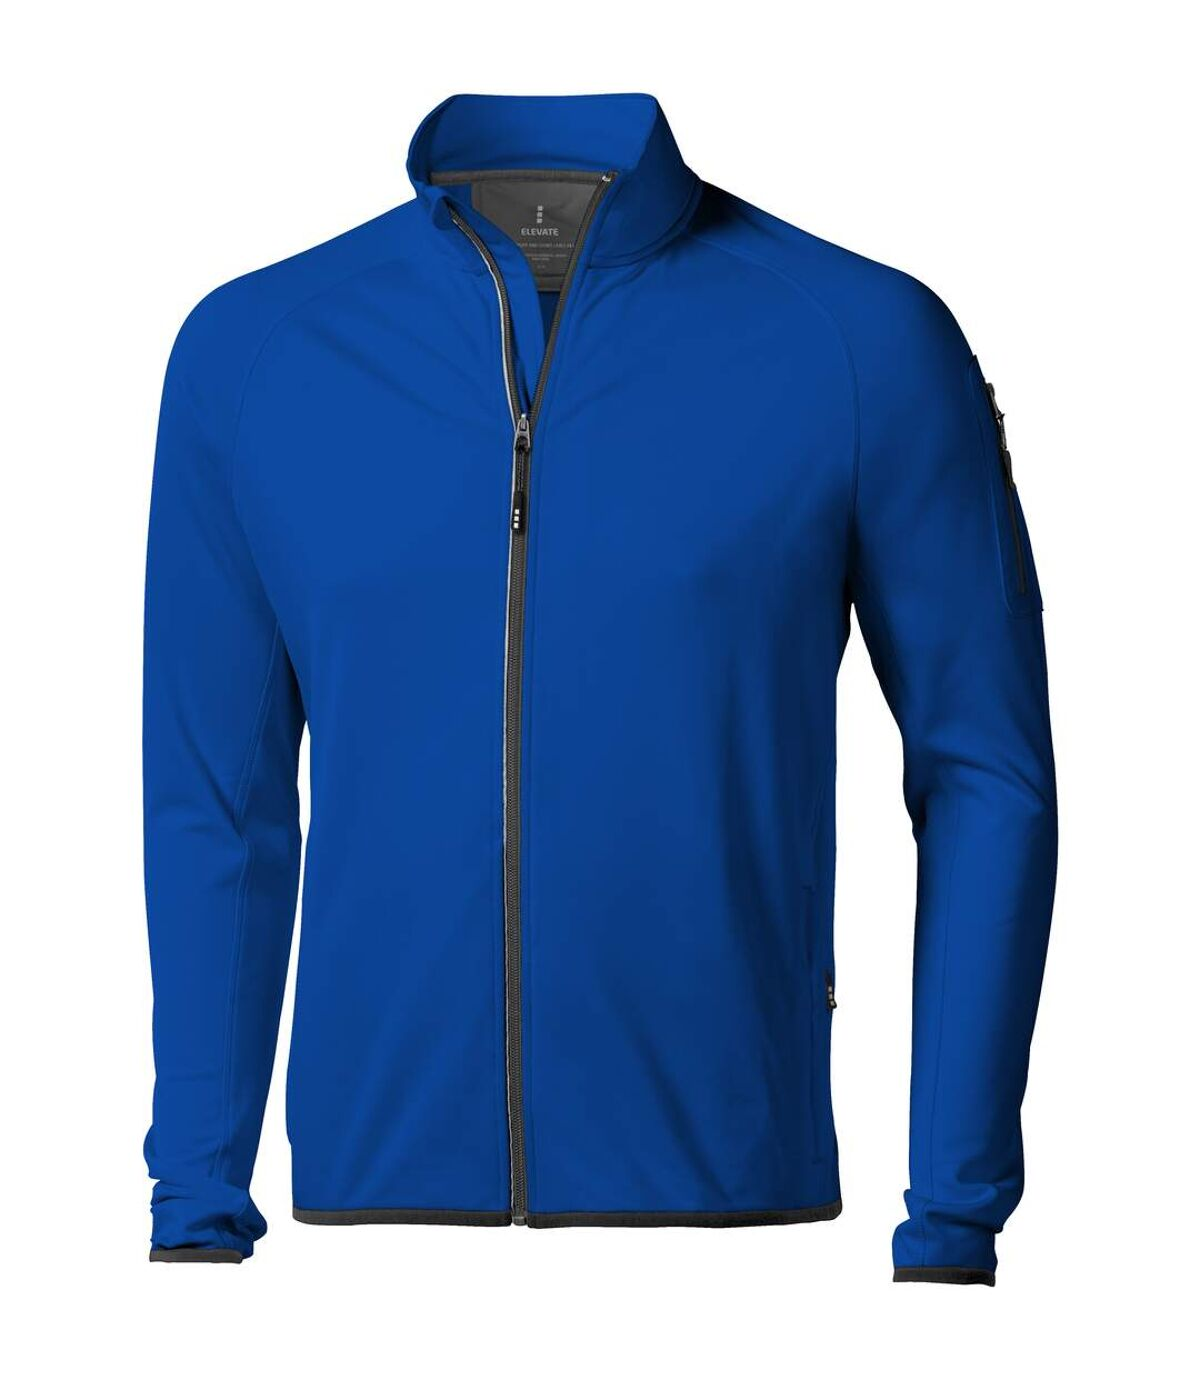 Elevate Mani Power - Veste polaire - Homme (Bleu) - UTPF1942